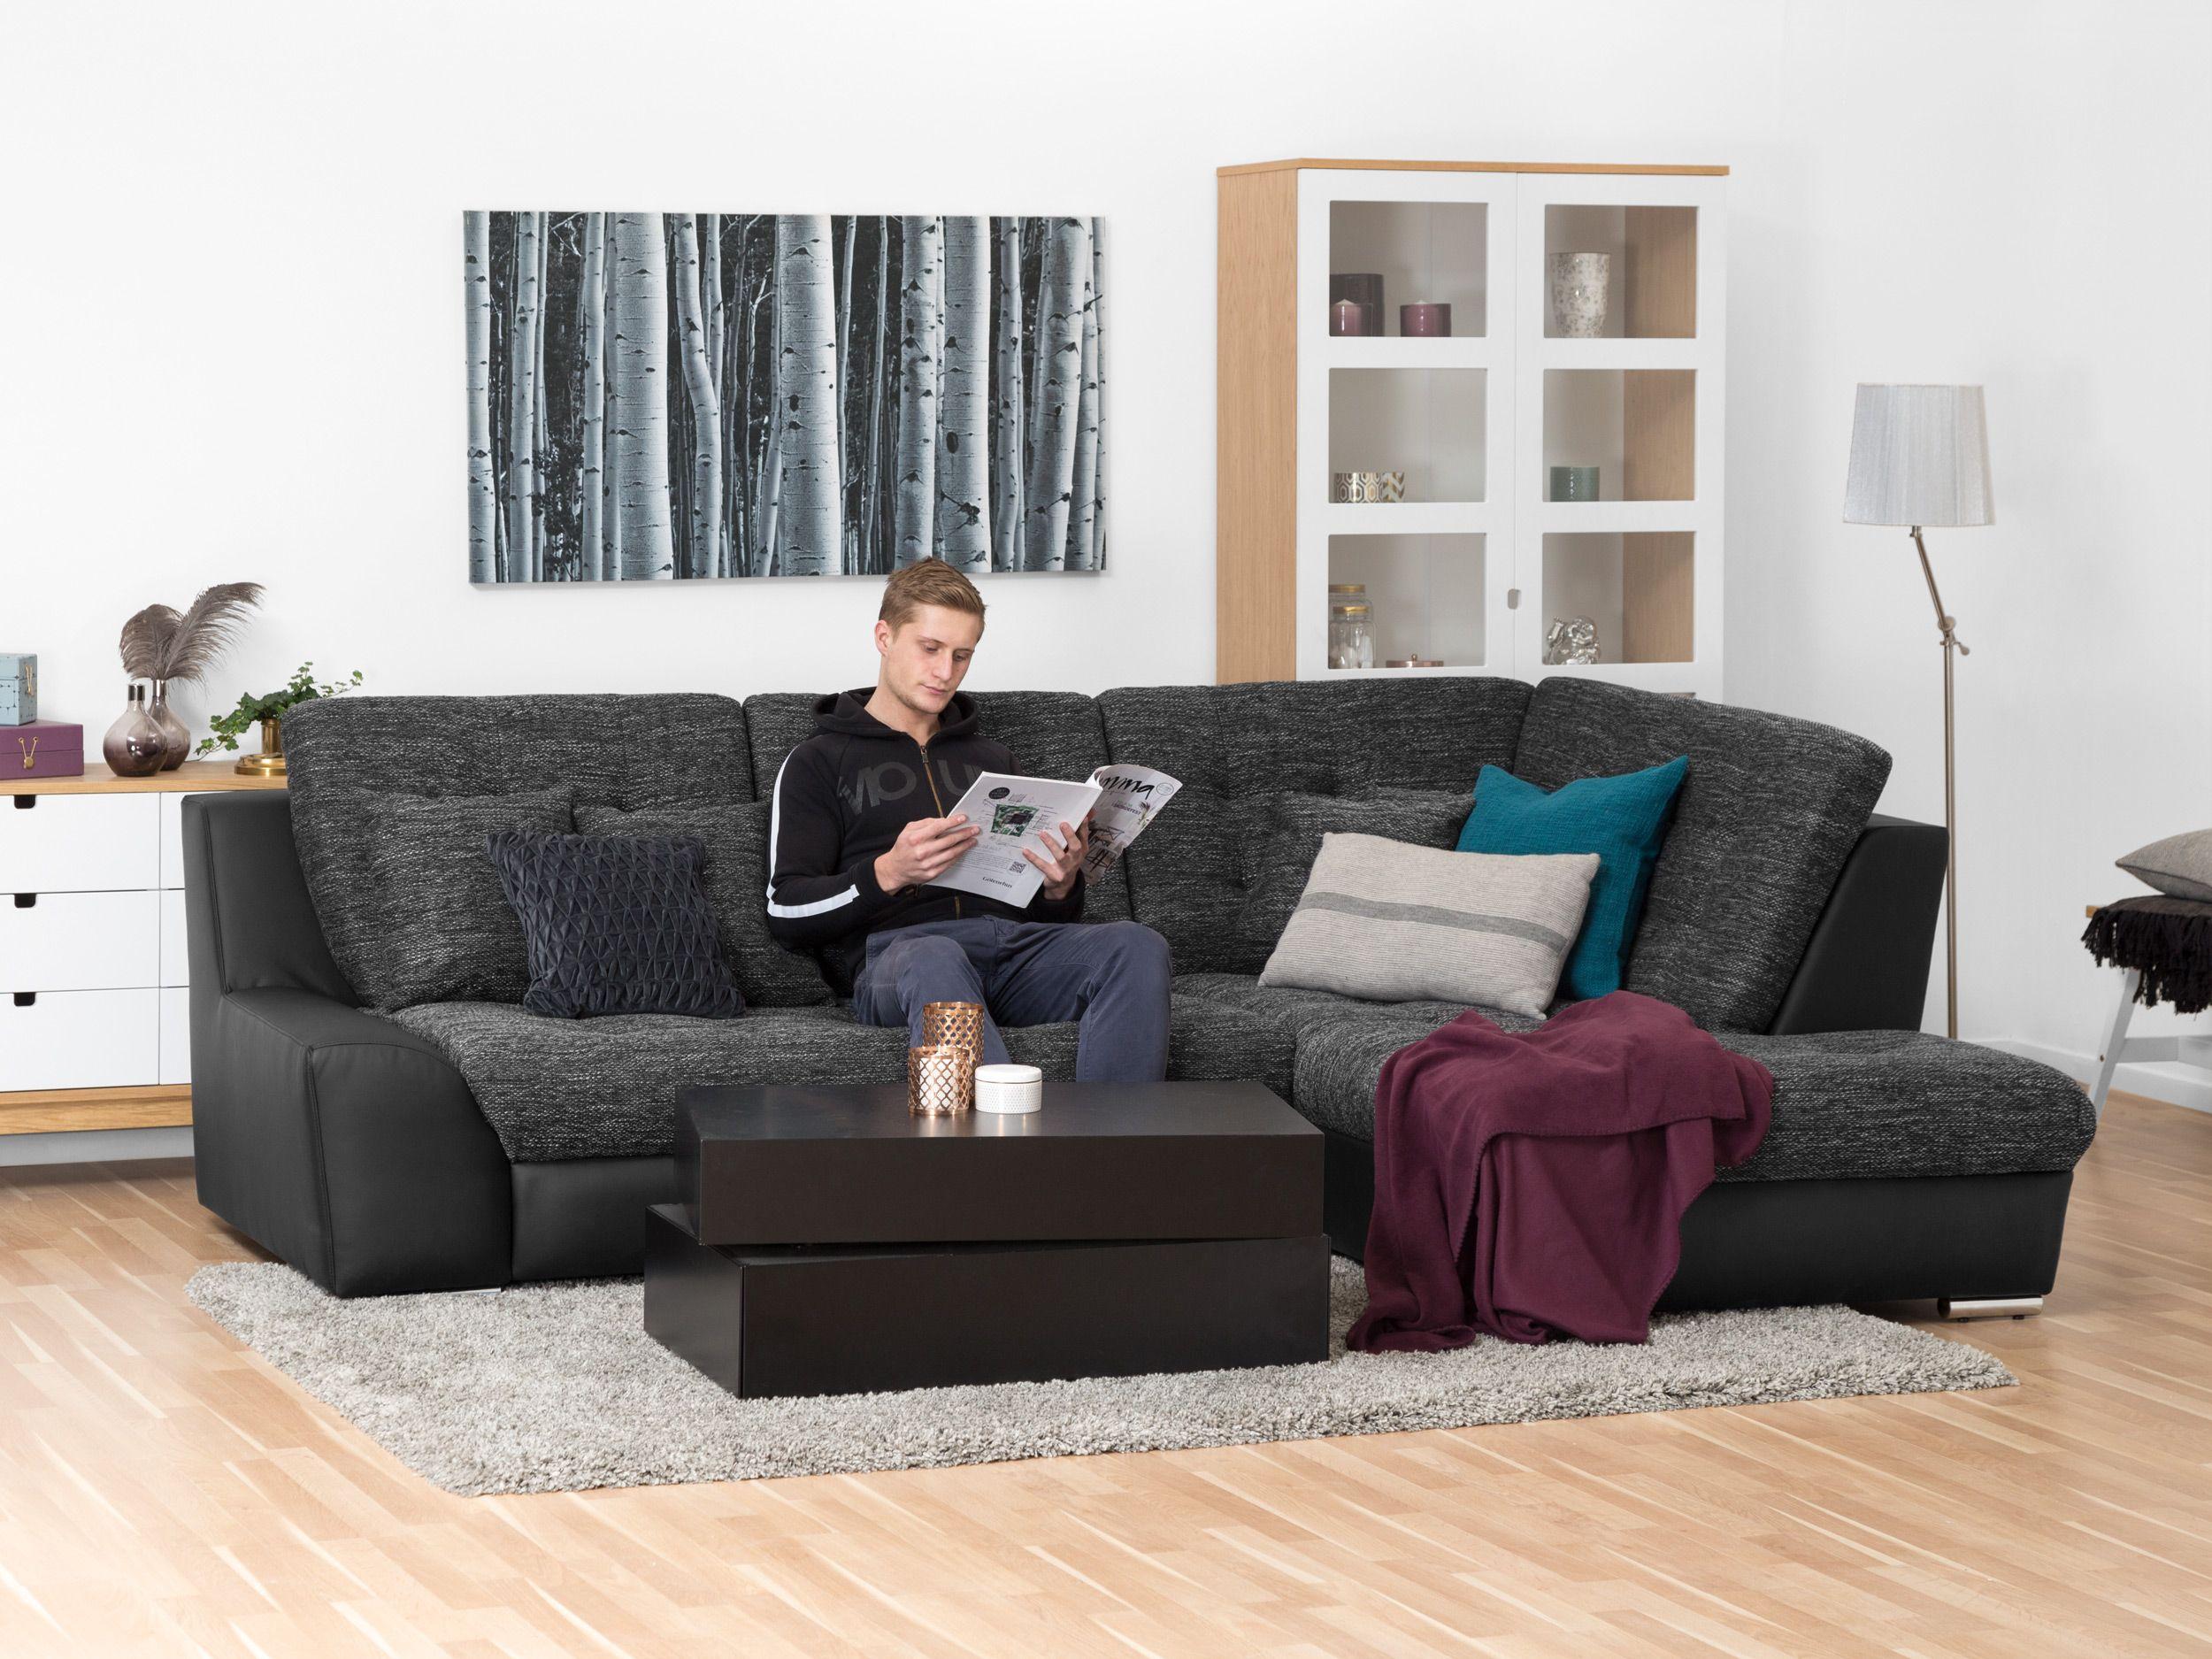 Arnis l soffa svart/grå   annorlunda l soffa i svart ...